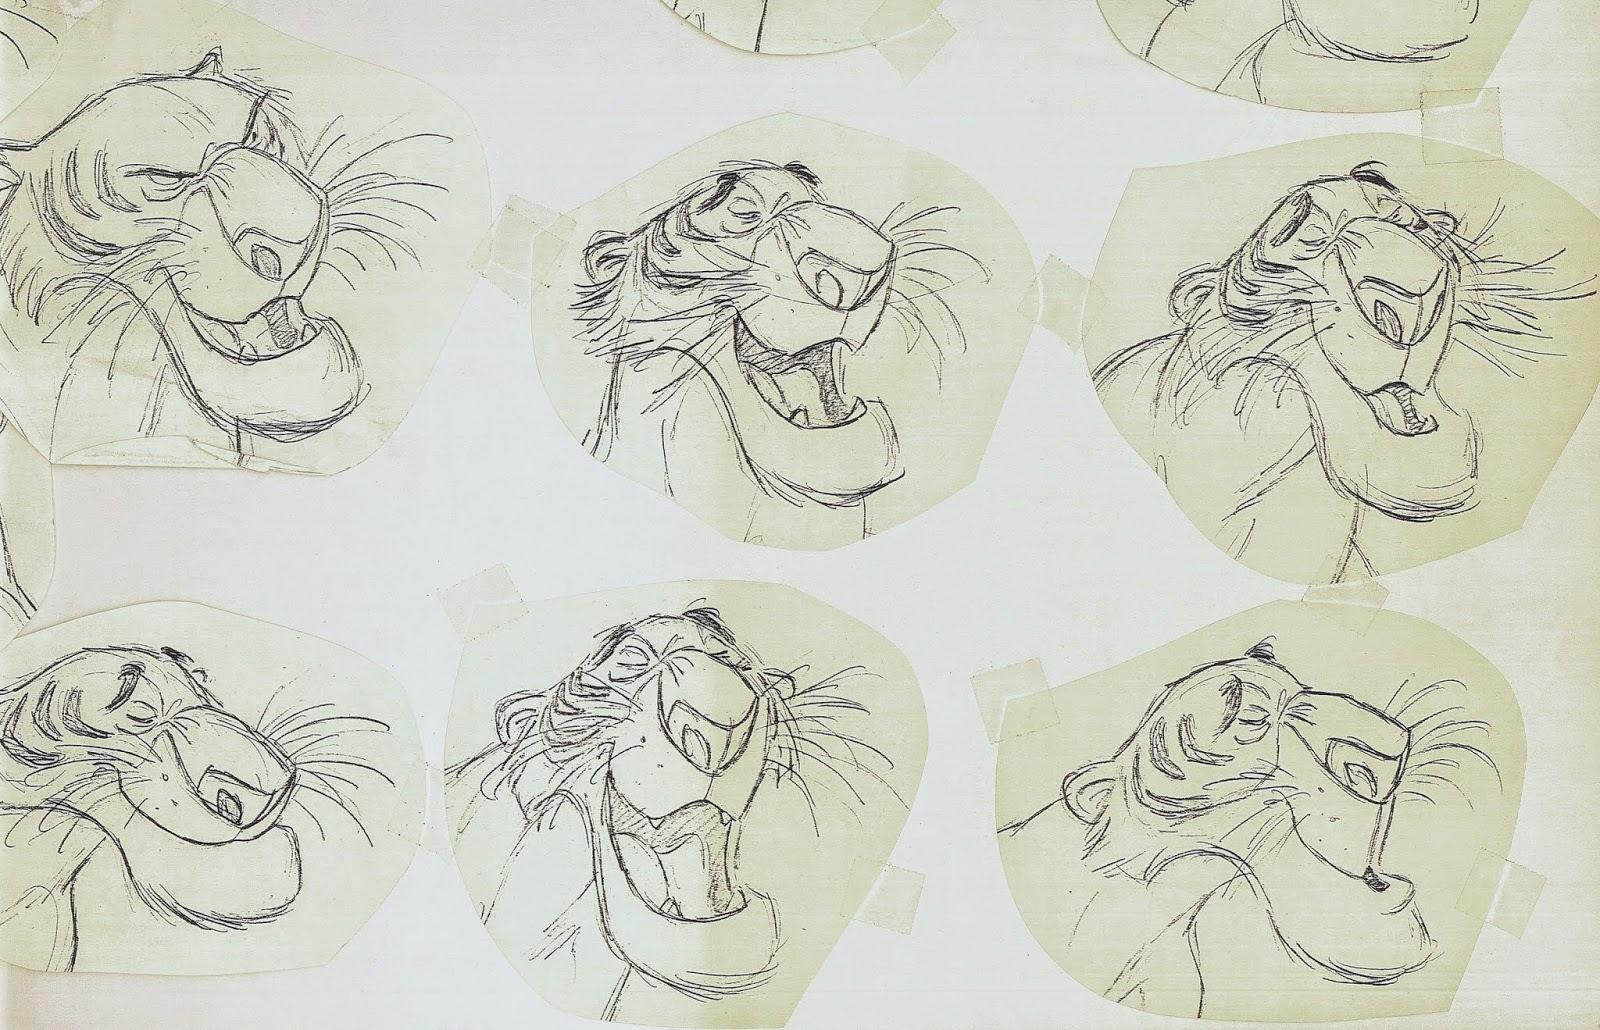 disney animation studios how to draw